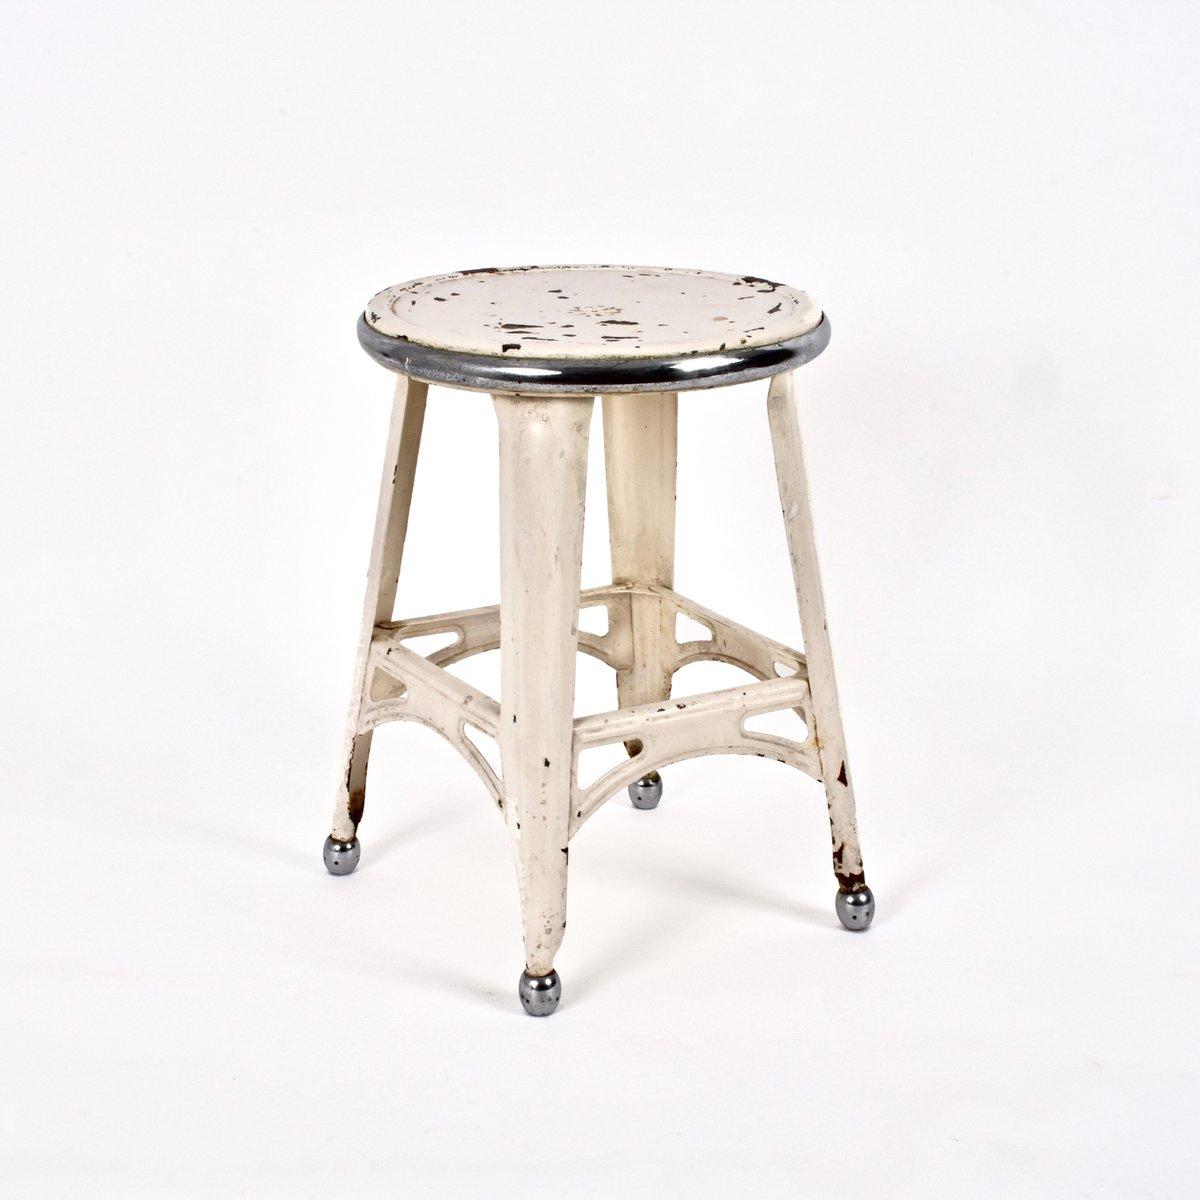 tabouret industriel en fer peint et acier chrom france 1940s en vente sur pamono. Black Bedroom Furniture Sets. Home Design Ideas